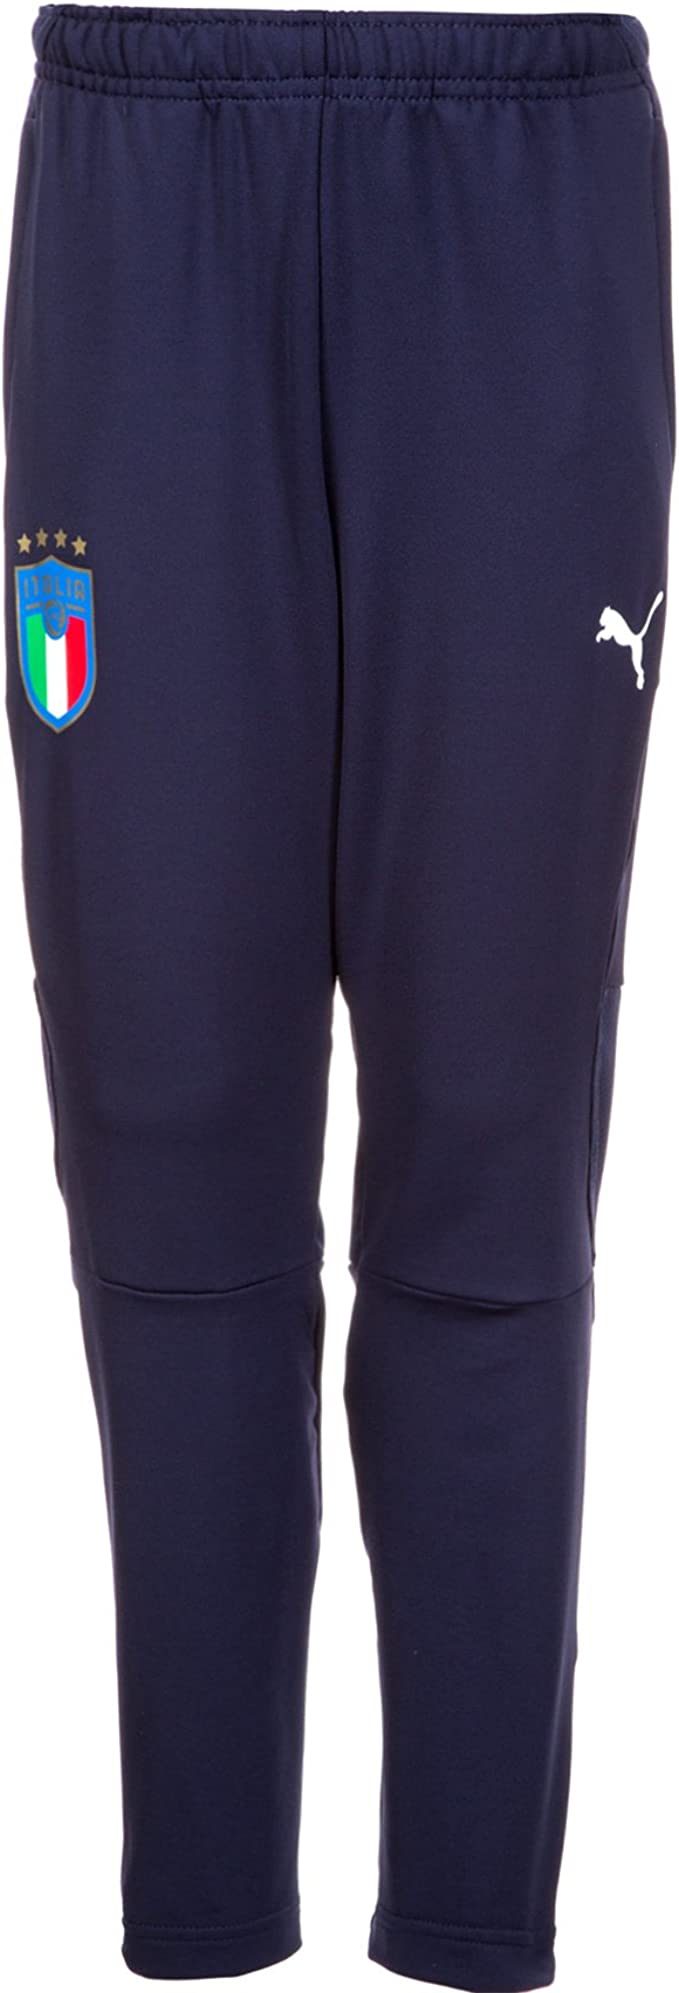 PUMA FIGC Italia Training Pants Zipped Pockets Jr Pantalón, Niños ...